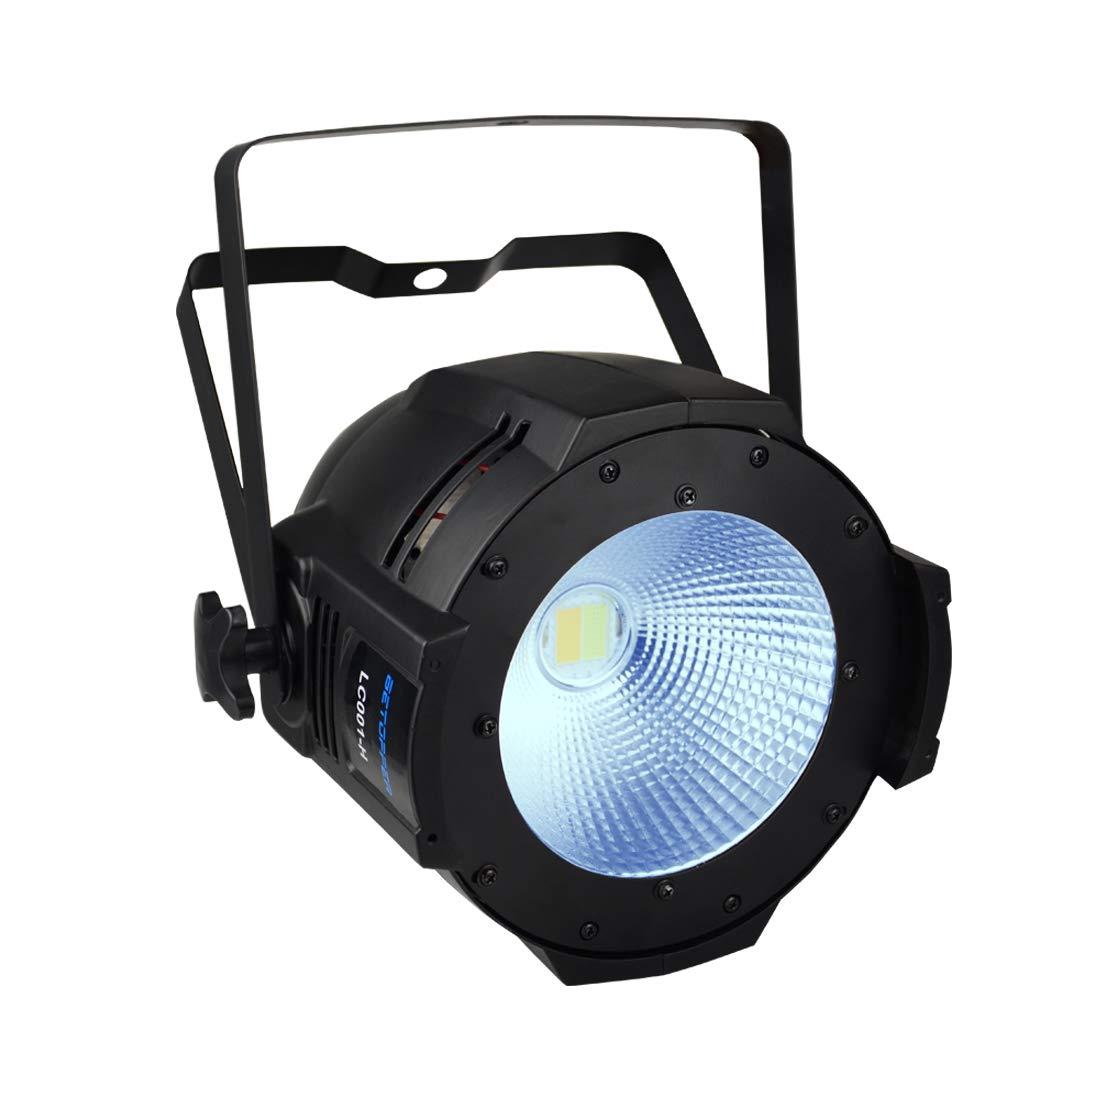 Betopper 100W COB DJ Wash Par Lights Super Bright LED Stage Lighting(One of the Most Professional Kits)